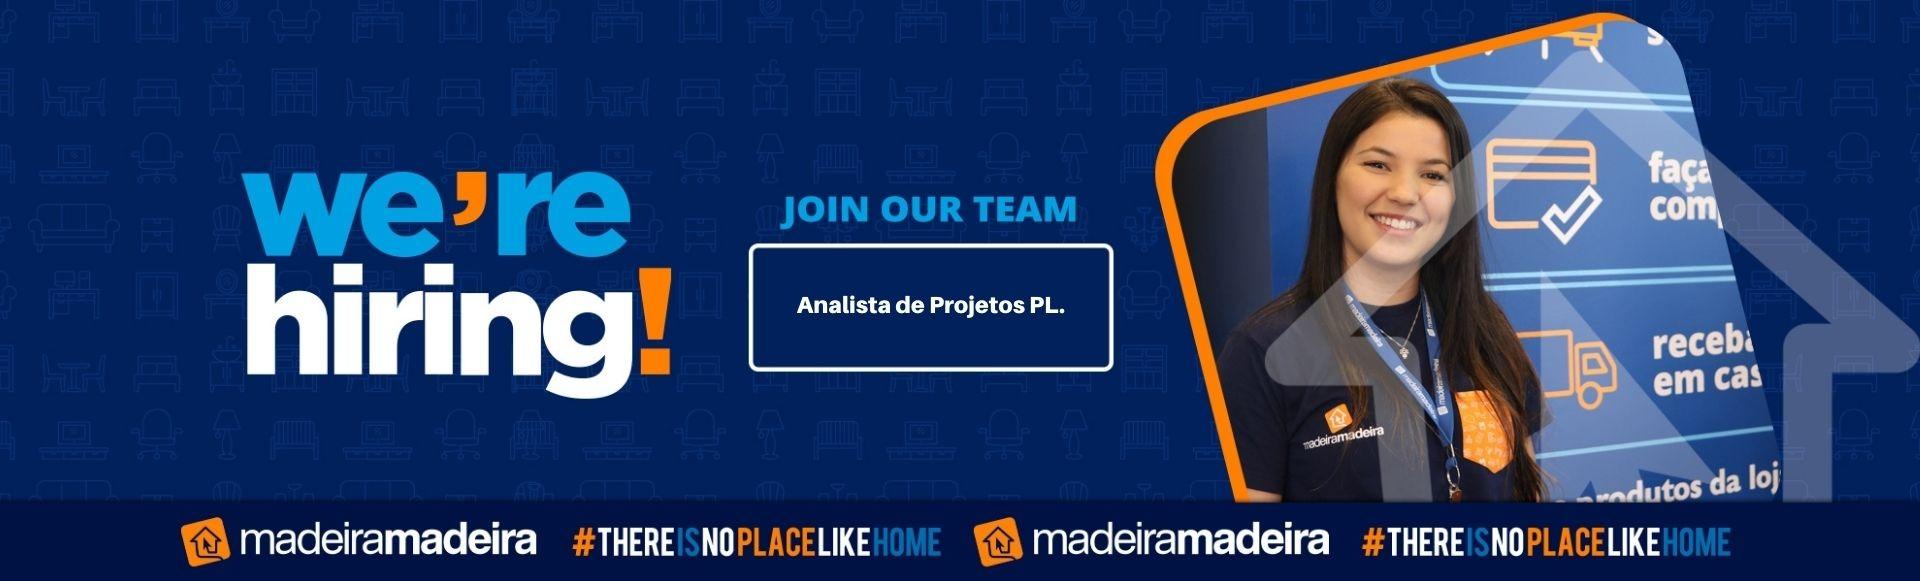 Analista de Projetos PL